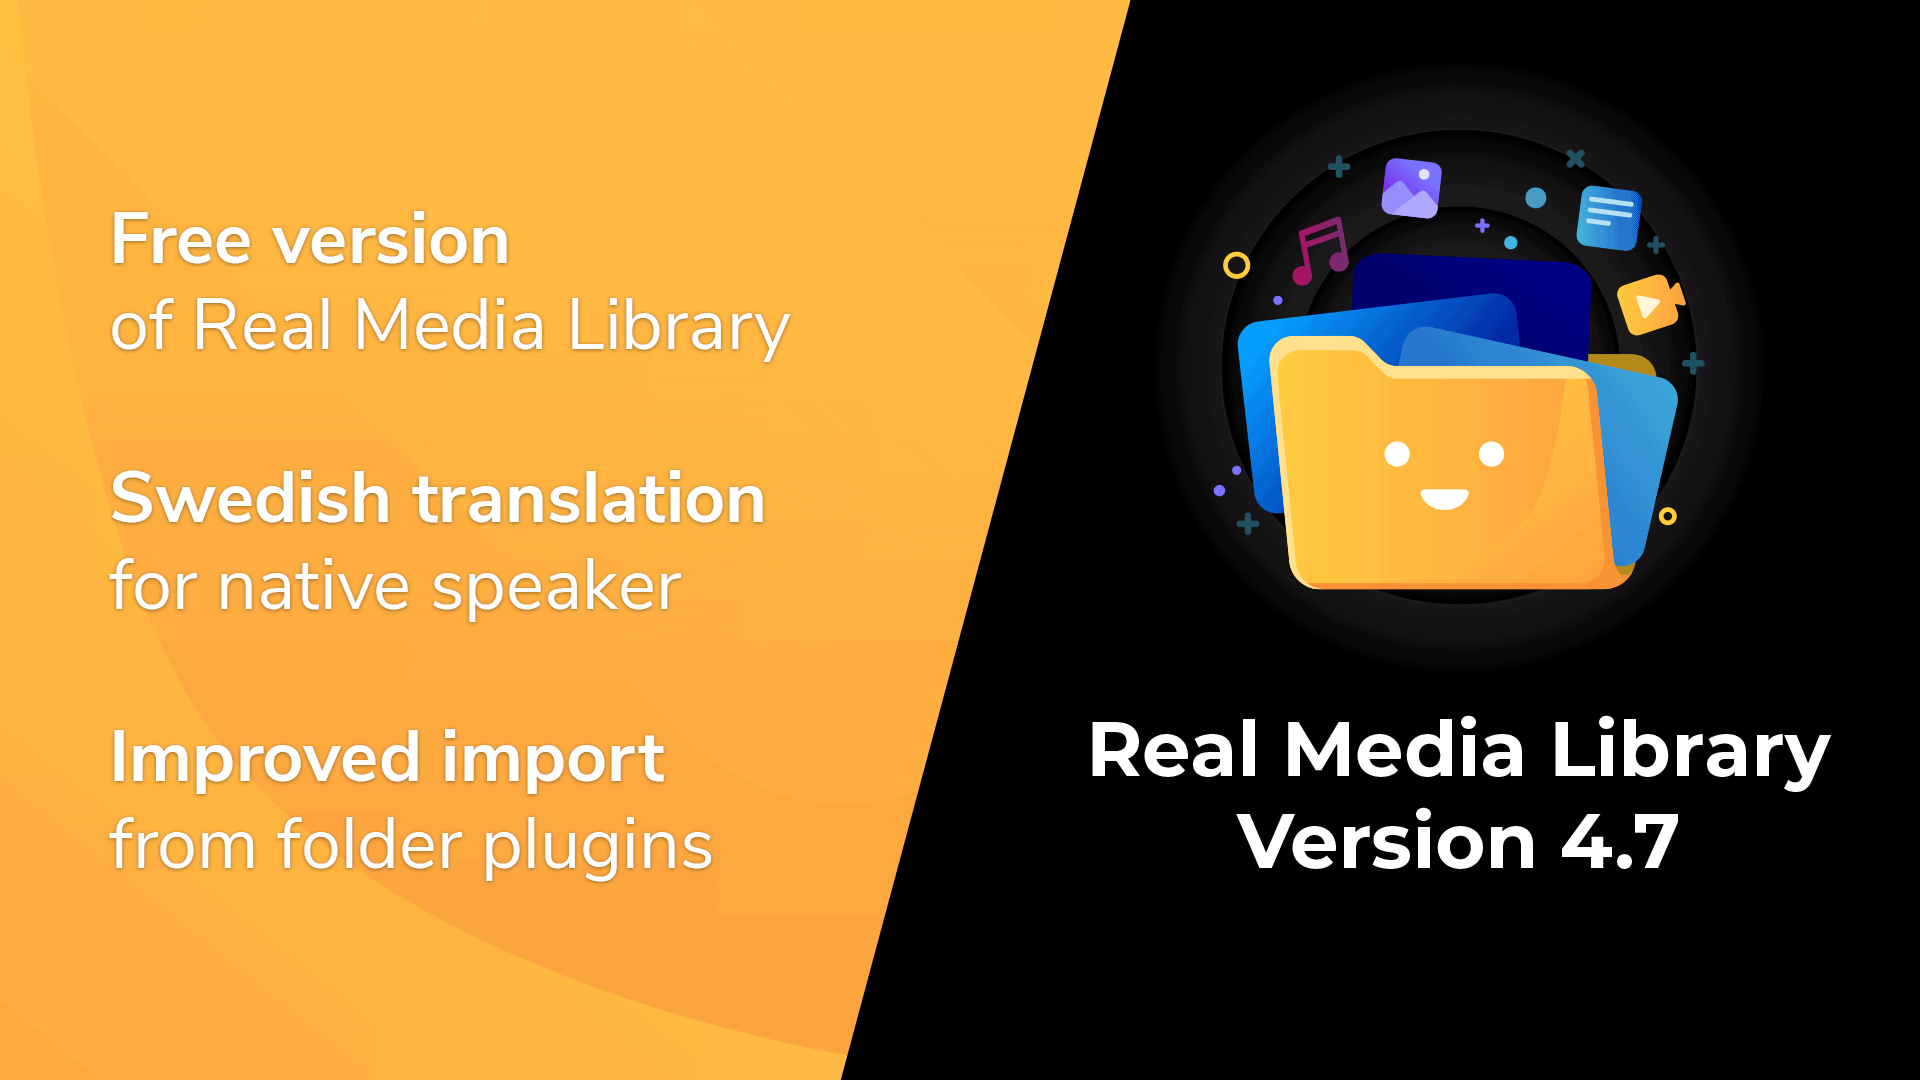 Real Media Library Version 4.7